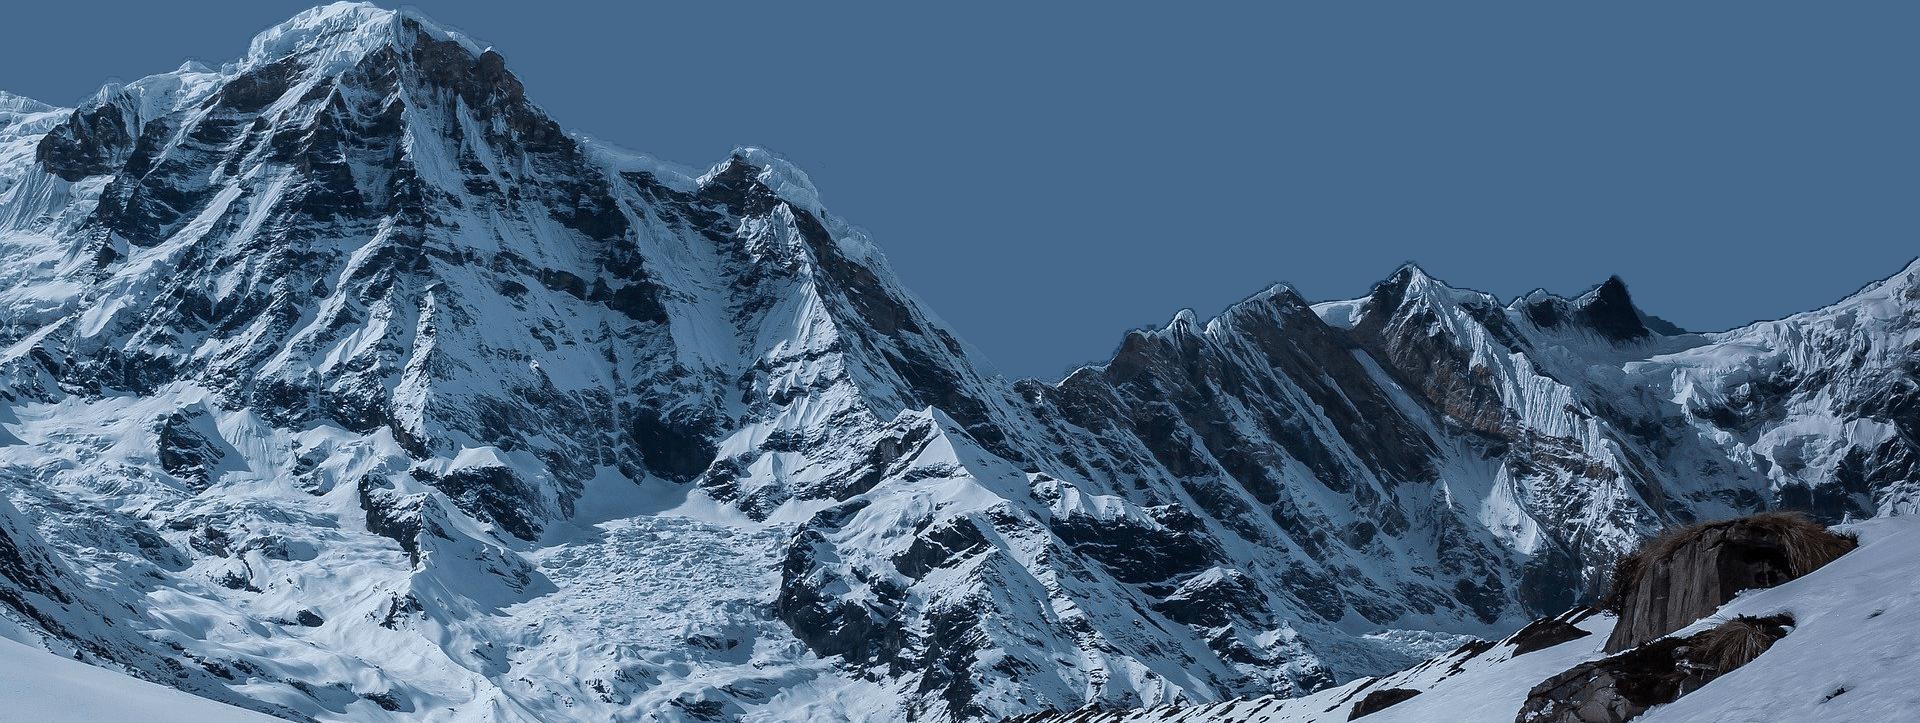 hegyek fooldal